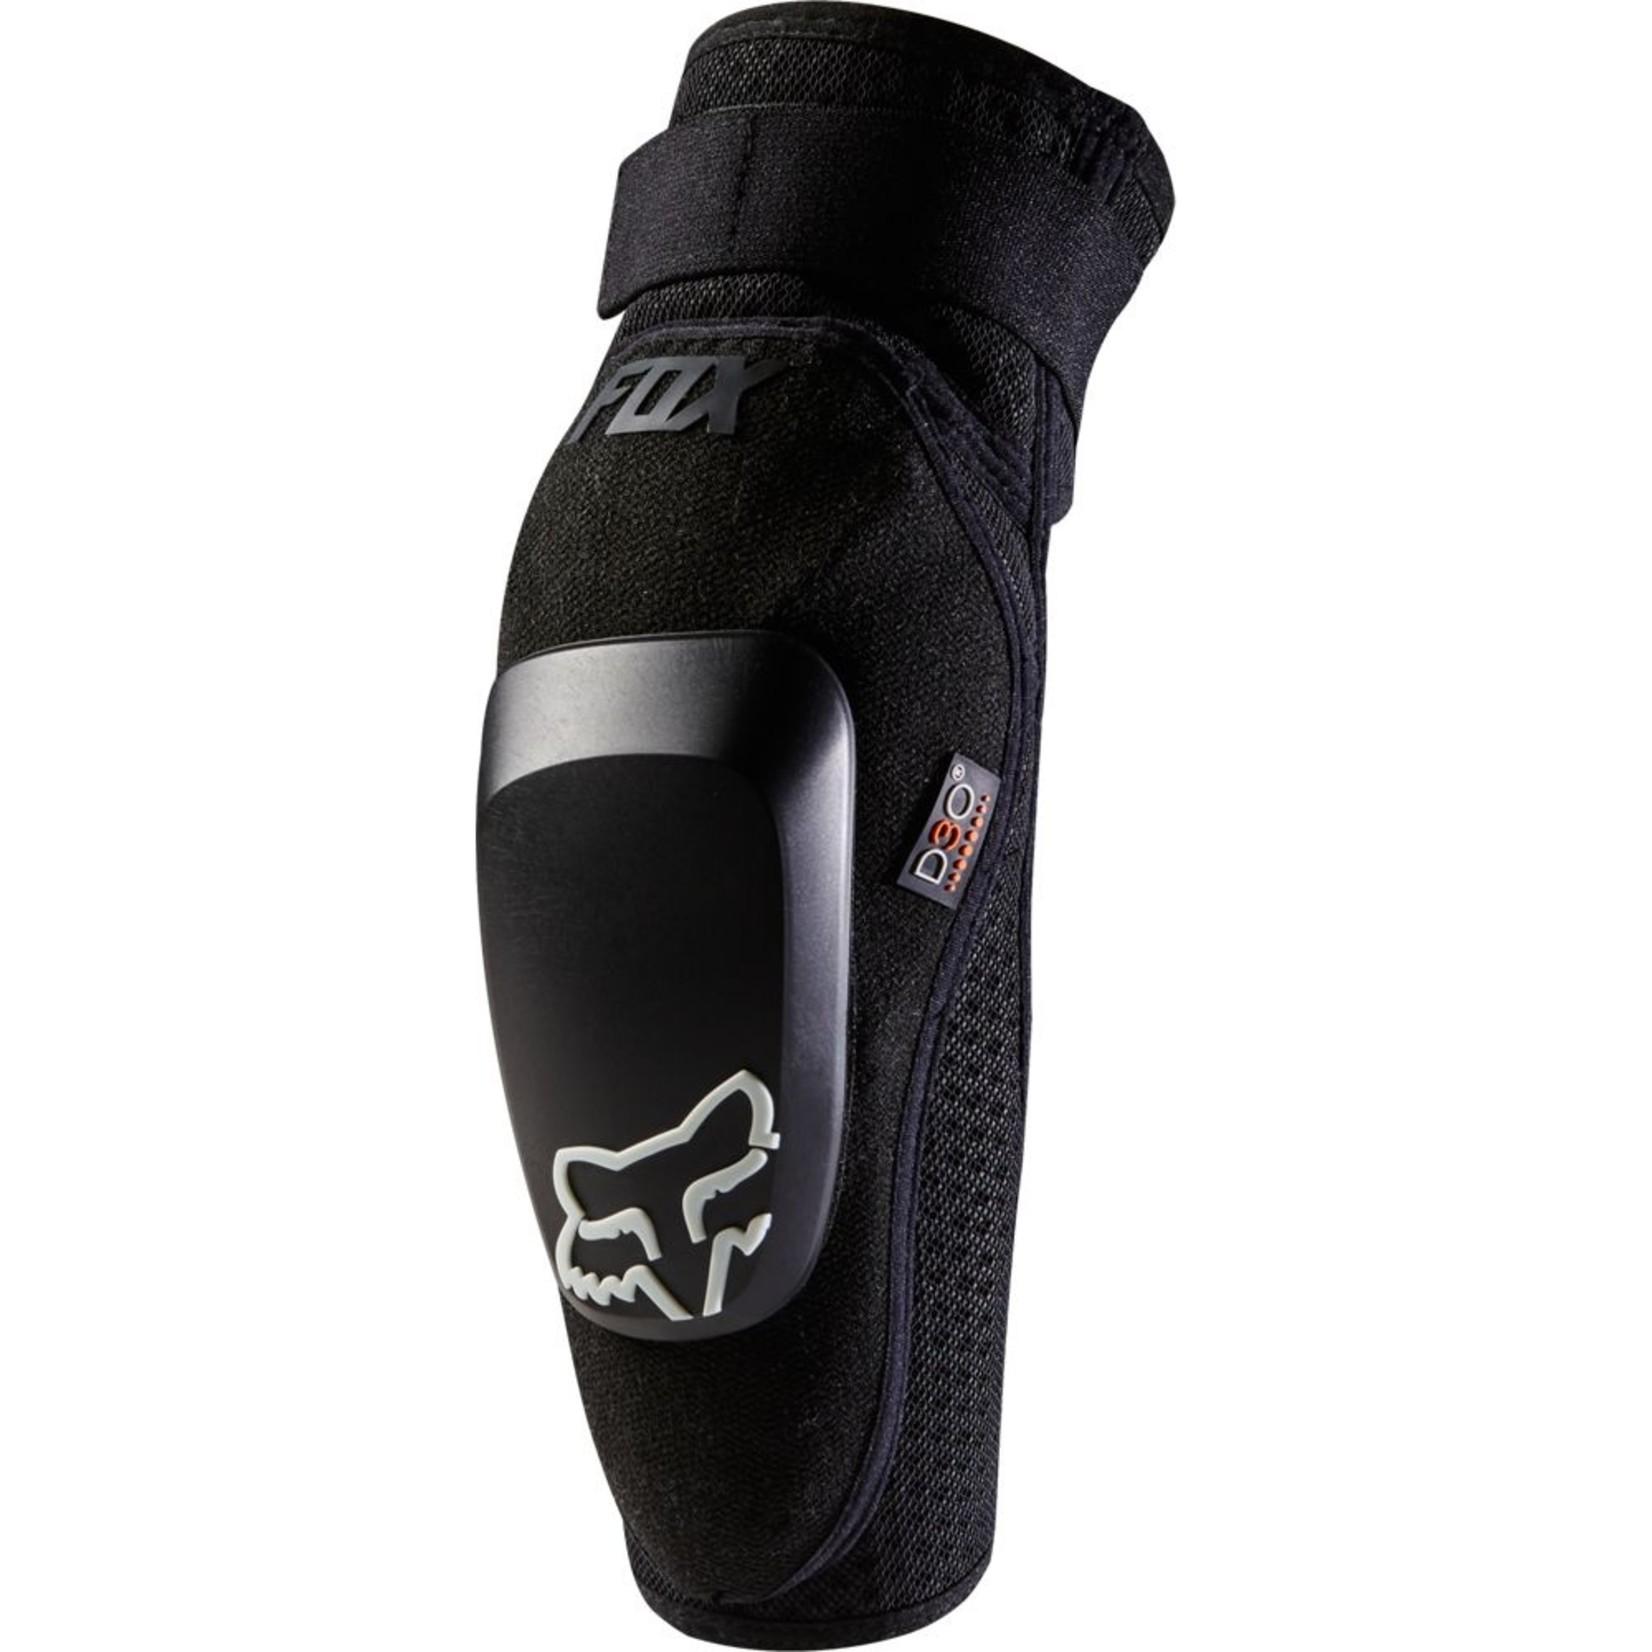 FOX Launch D30 Elbow Pad